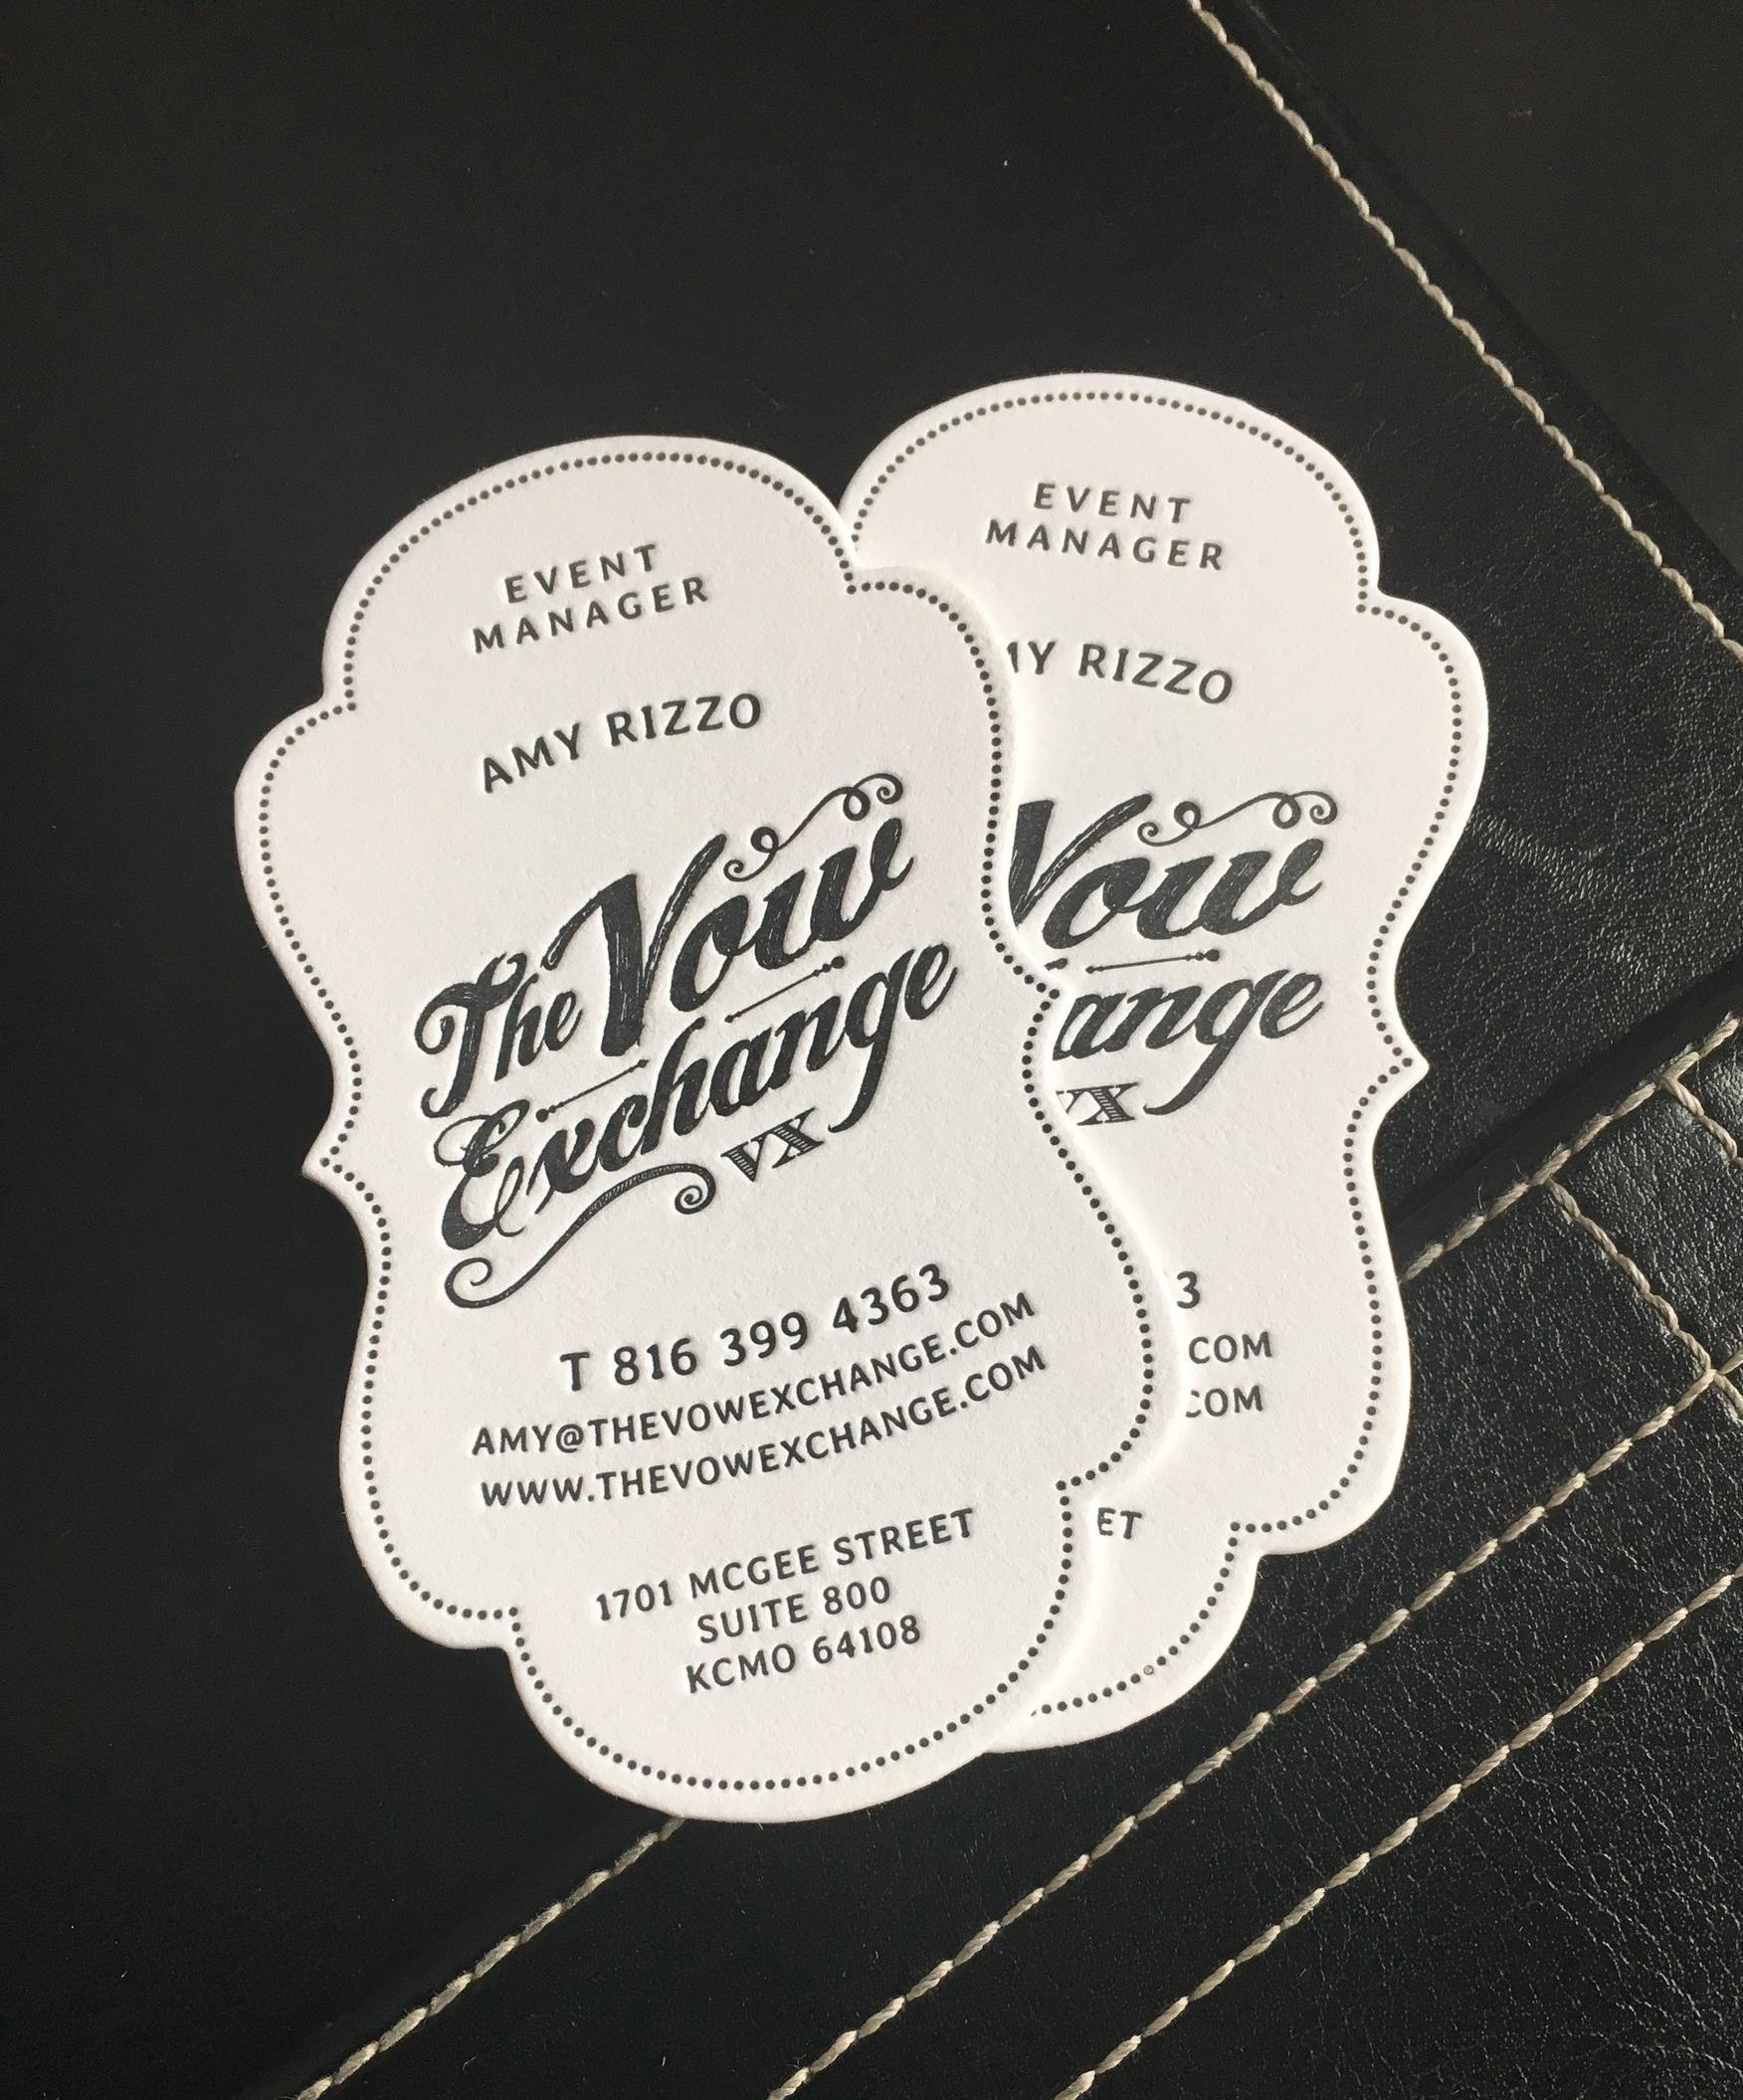 Amy Rizzo TVX Hammerpress Business Card.jpg